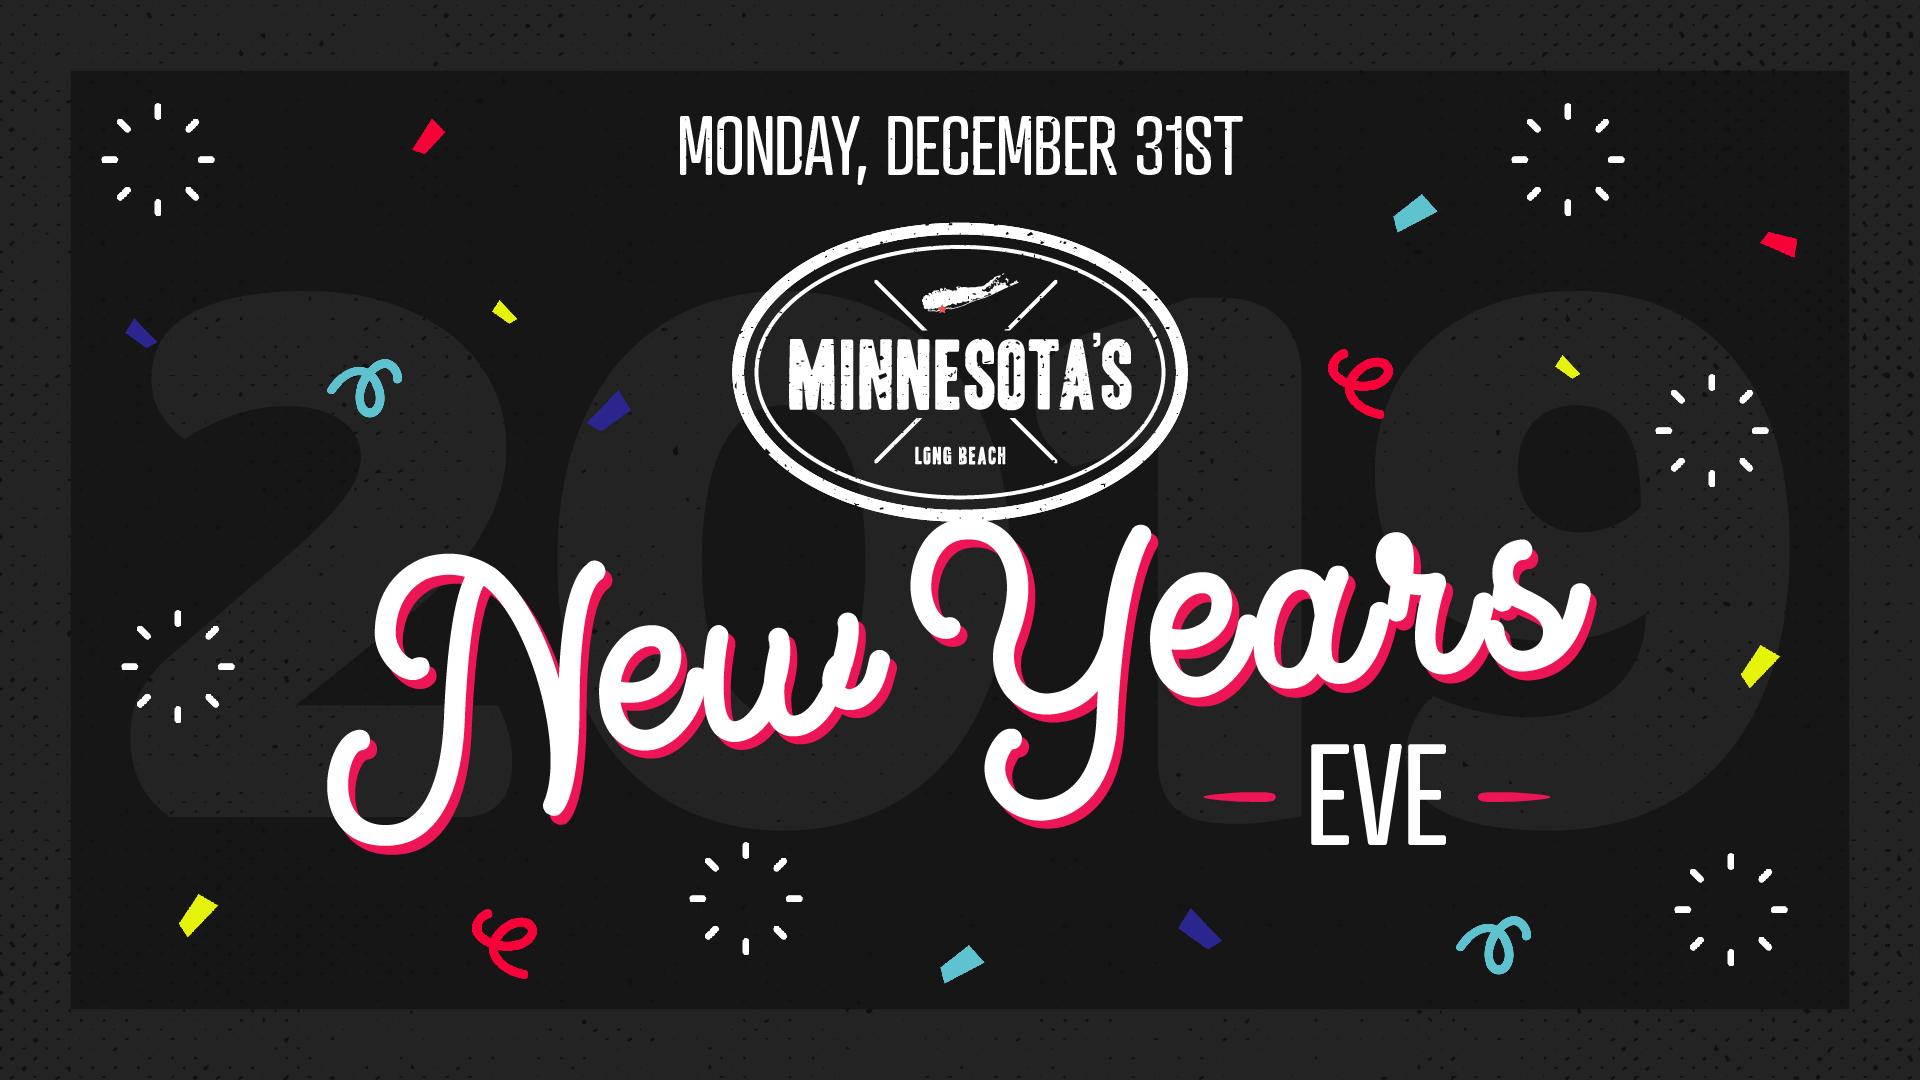 new years eve_event-01.jpg